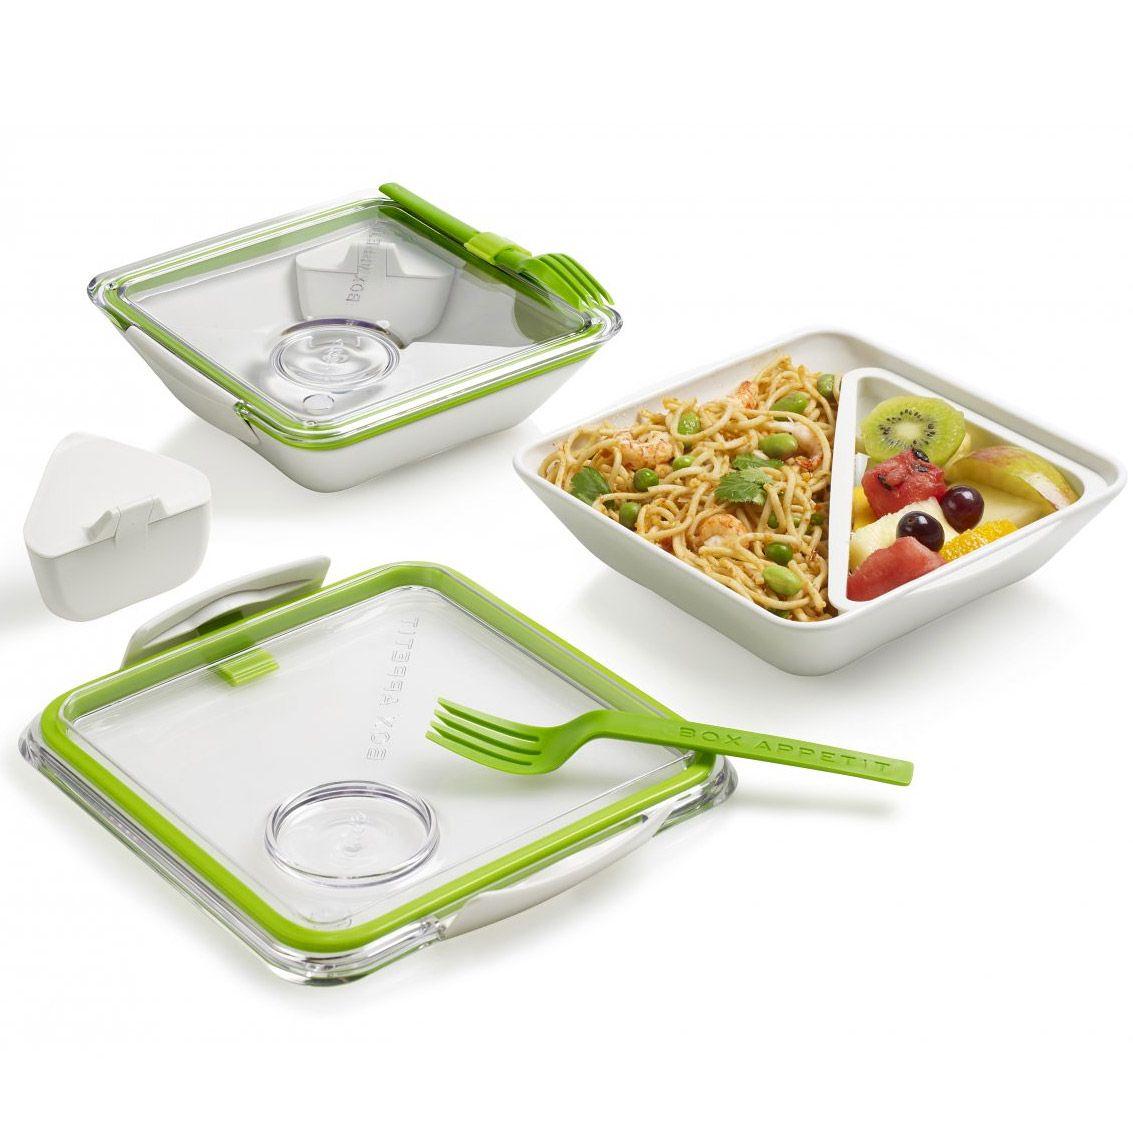 Ланч - бокс Box Appetit лаймПодарки<br>Ланч - бокс Box Appetit (лайм)<br>Размер: 19 х 19 х 5.5 см.; Объем: None; Материал: Полипропилен, силикон; Цвет: Белый / Зеленый;